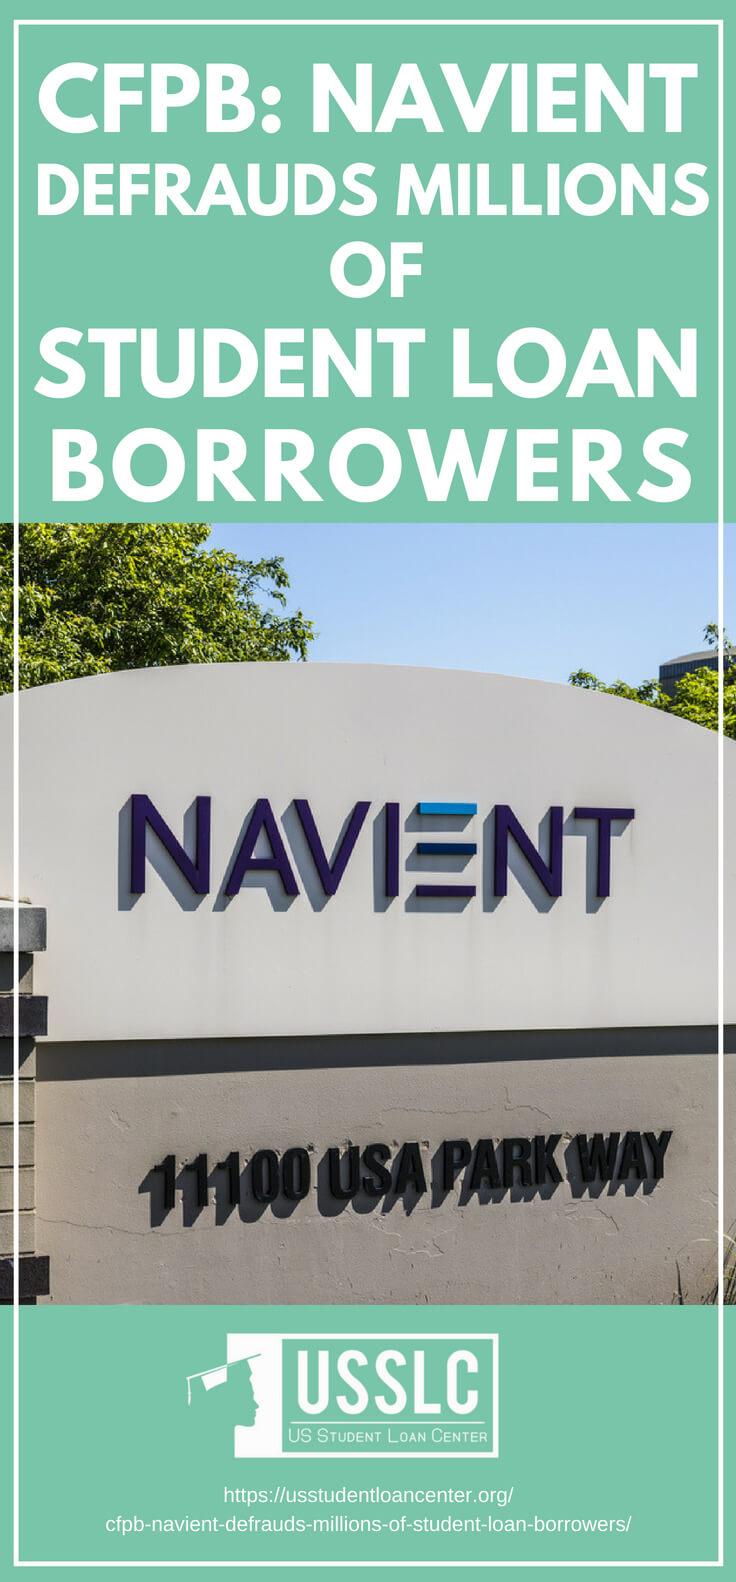 PLACARD | CFPB: Navient Defrauds Millions of Student Loan Borrowers